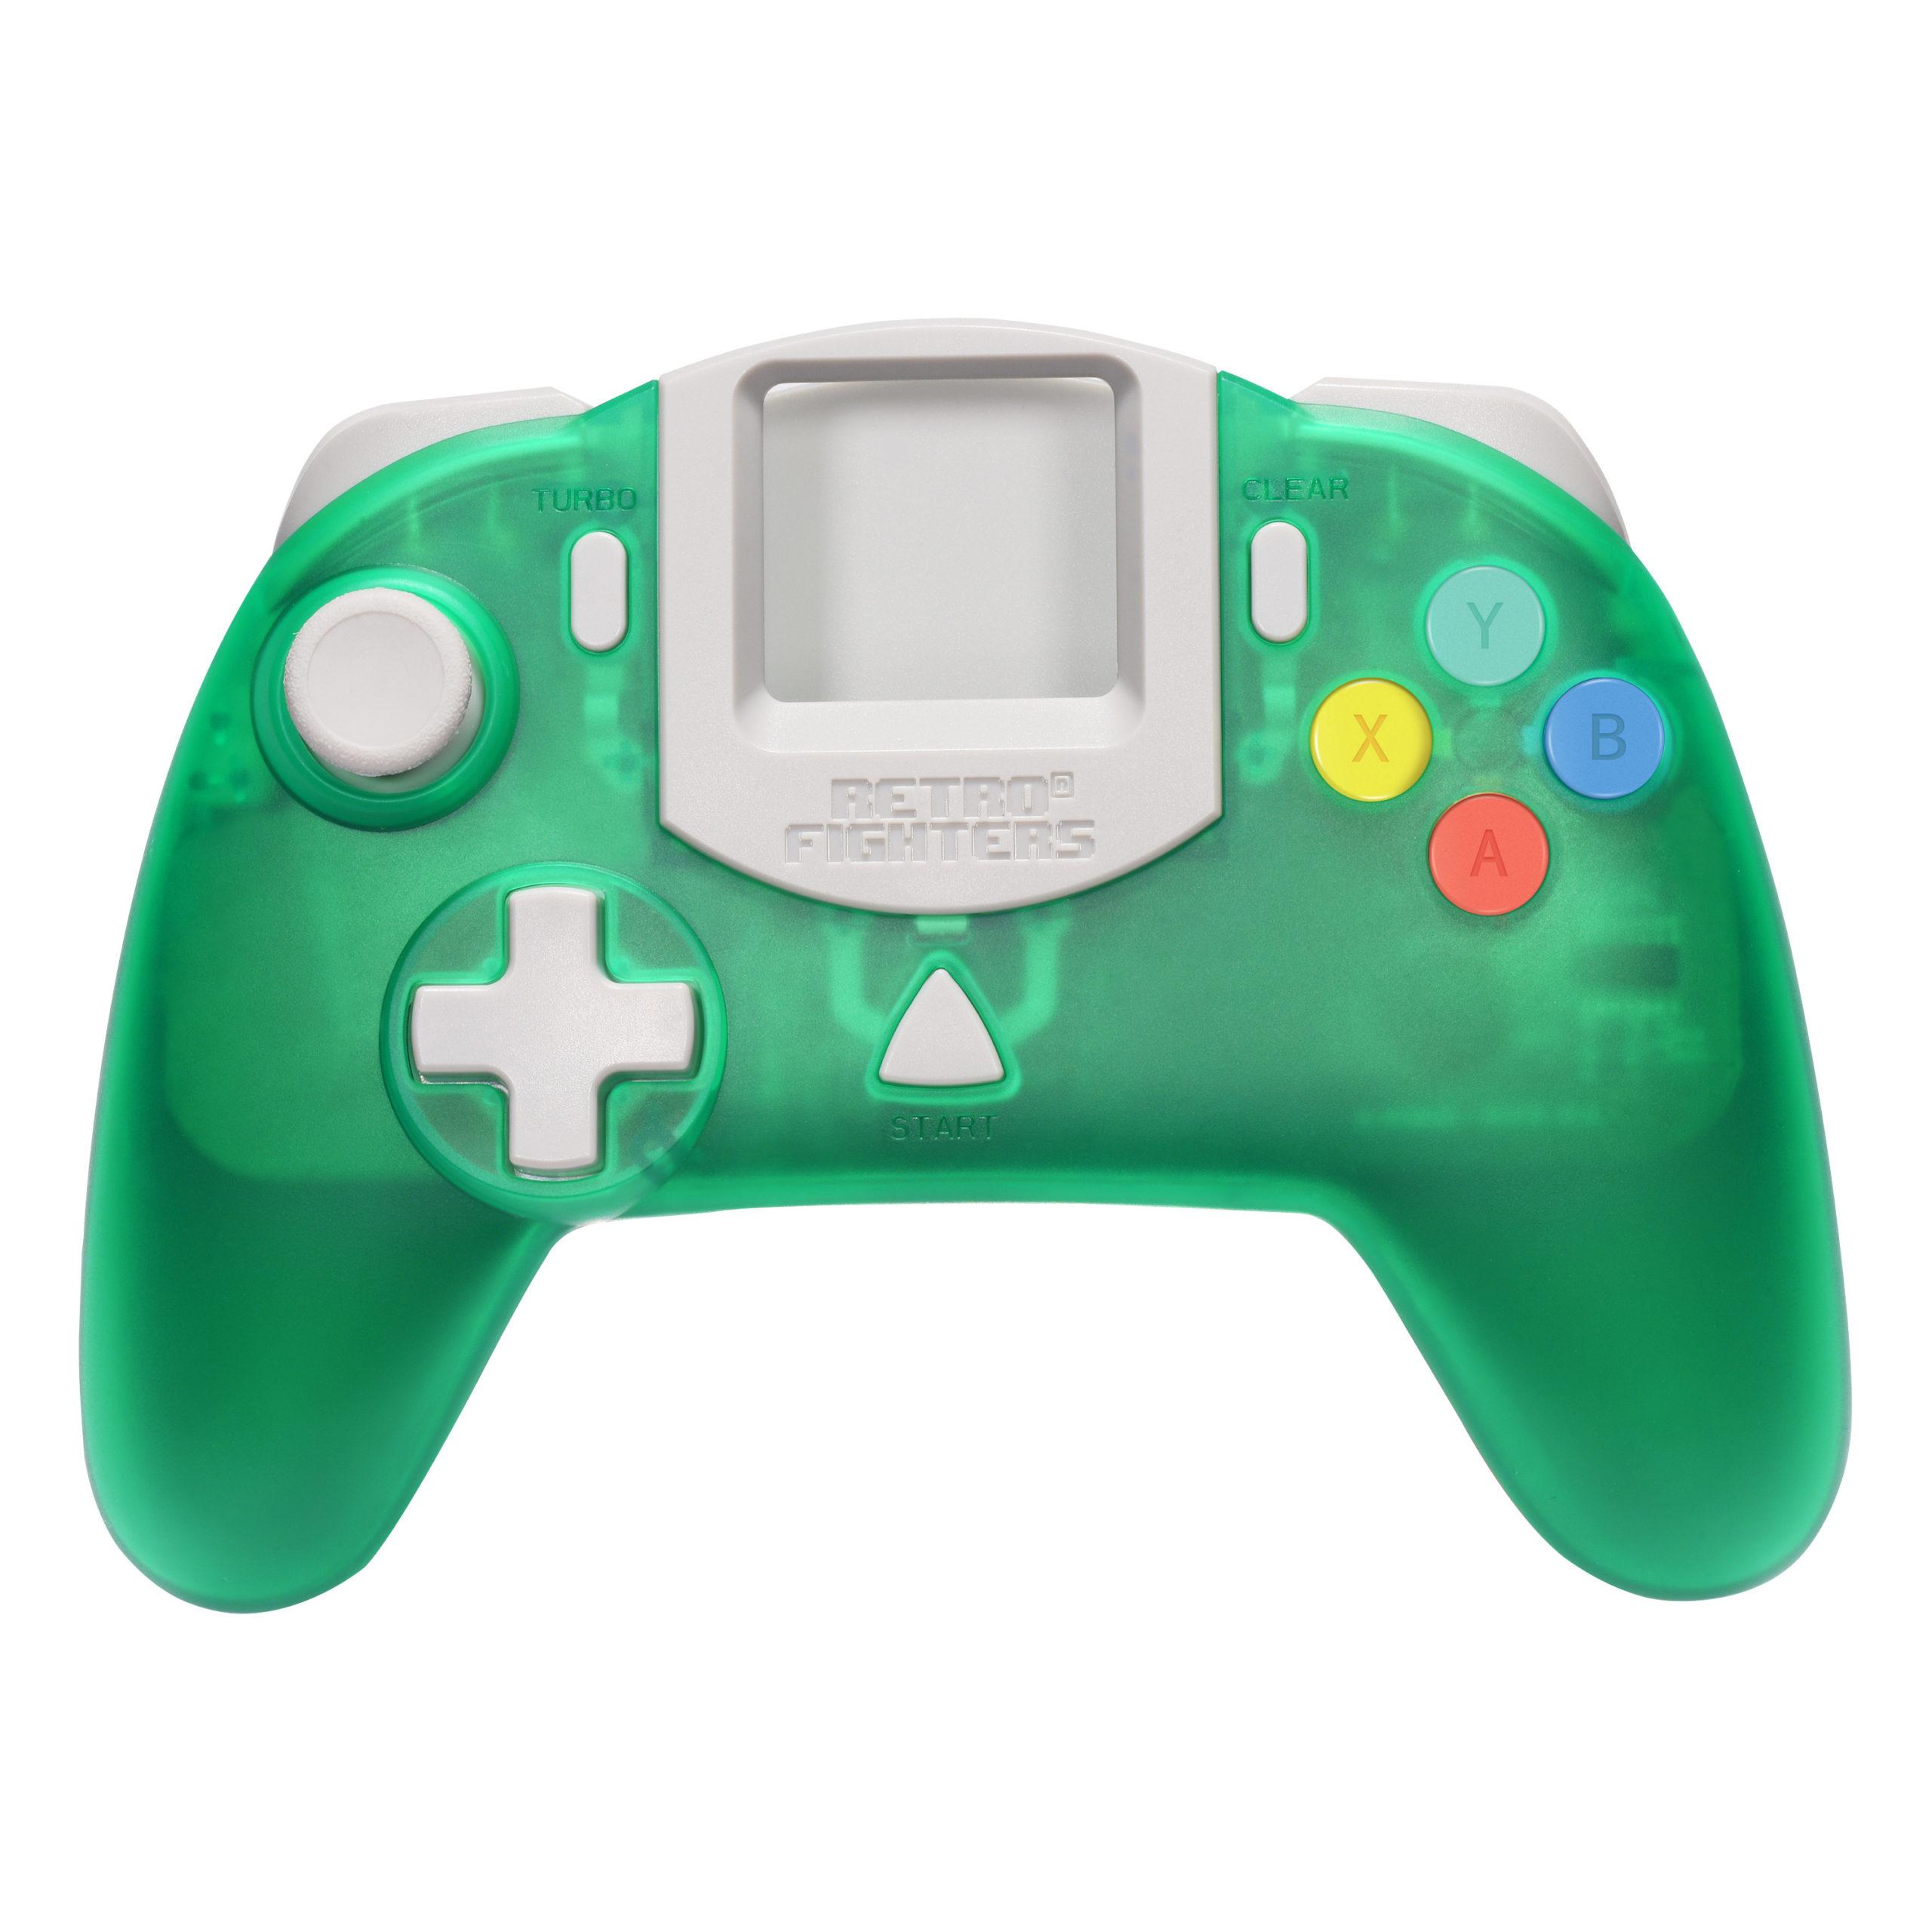 StrikerDC Green (2)